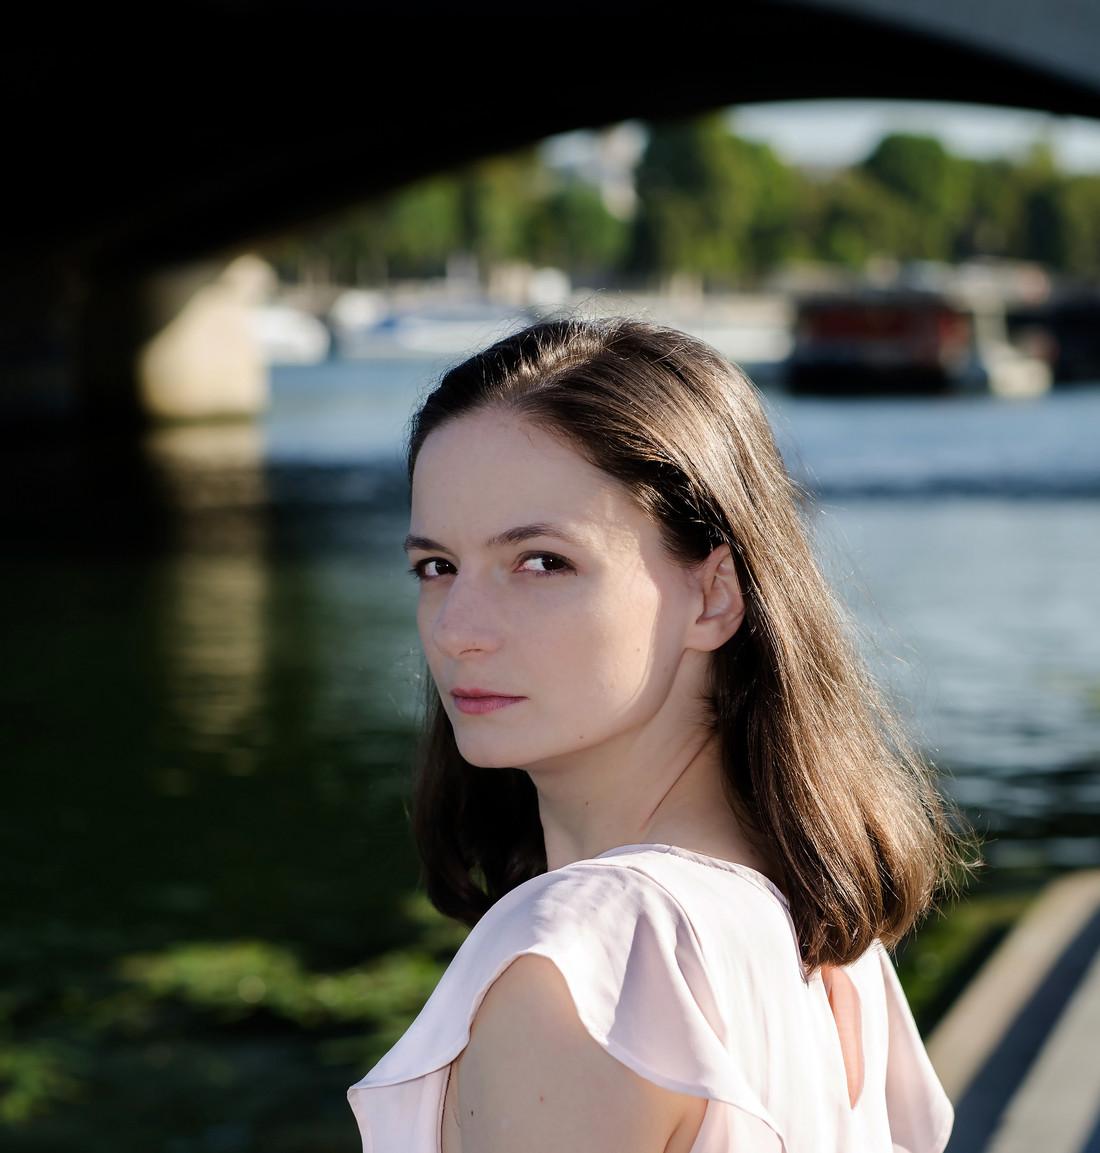 Malory De Lenclos